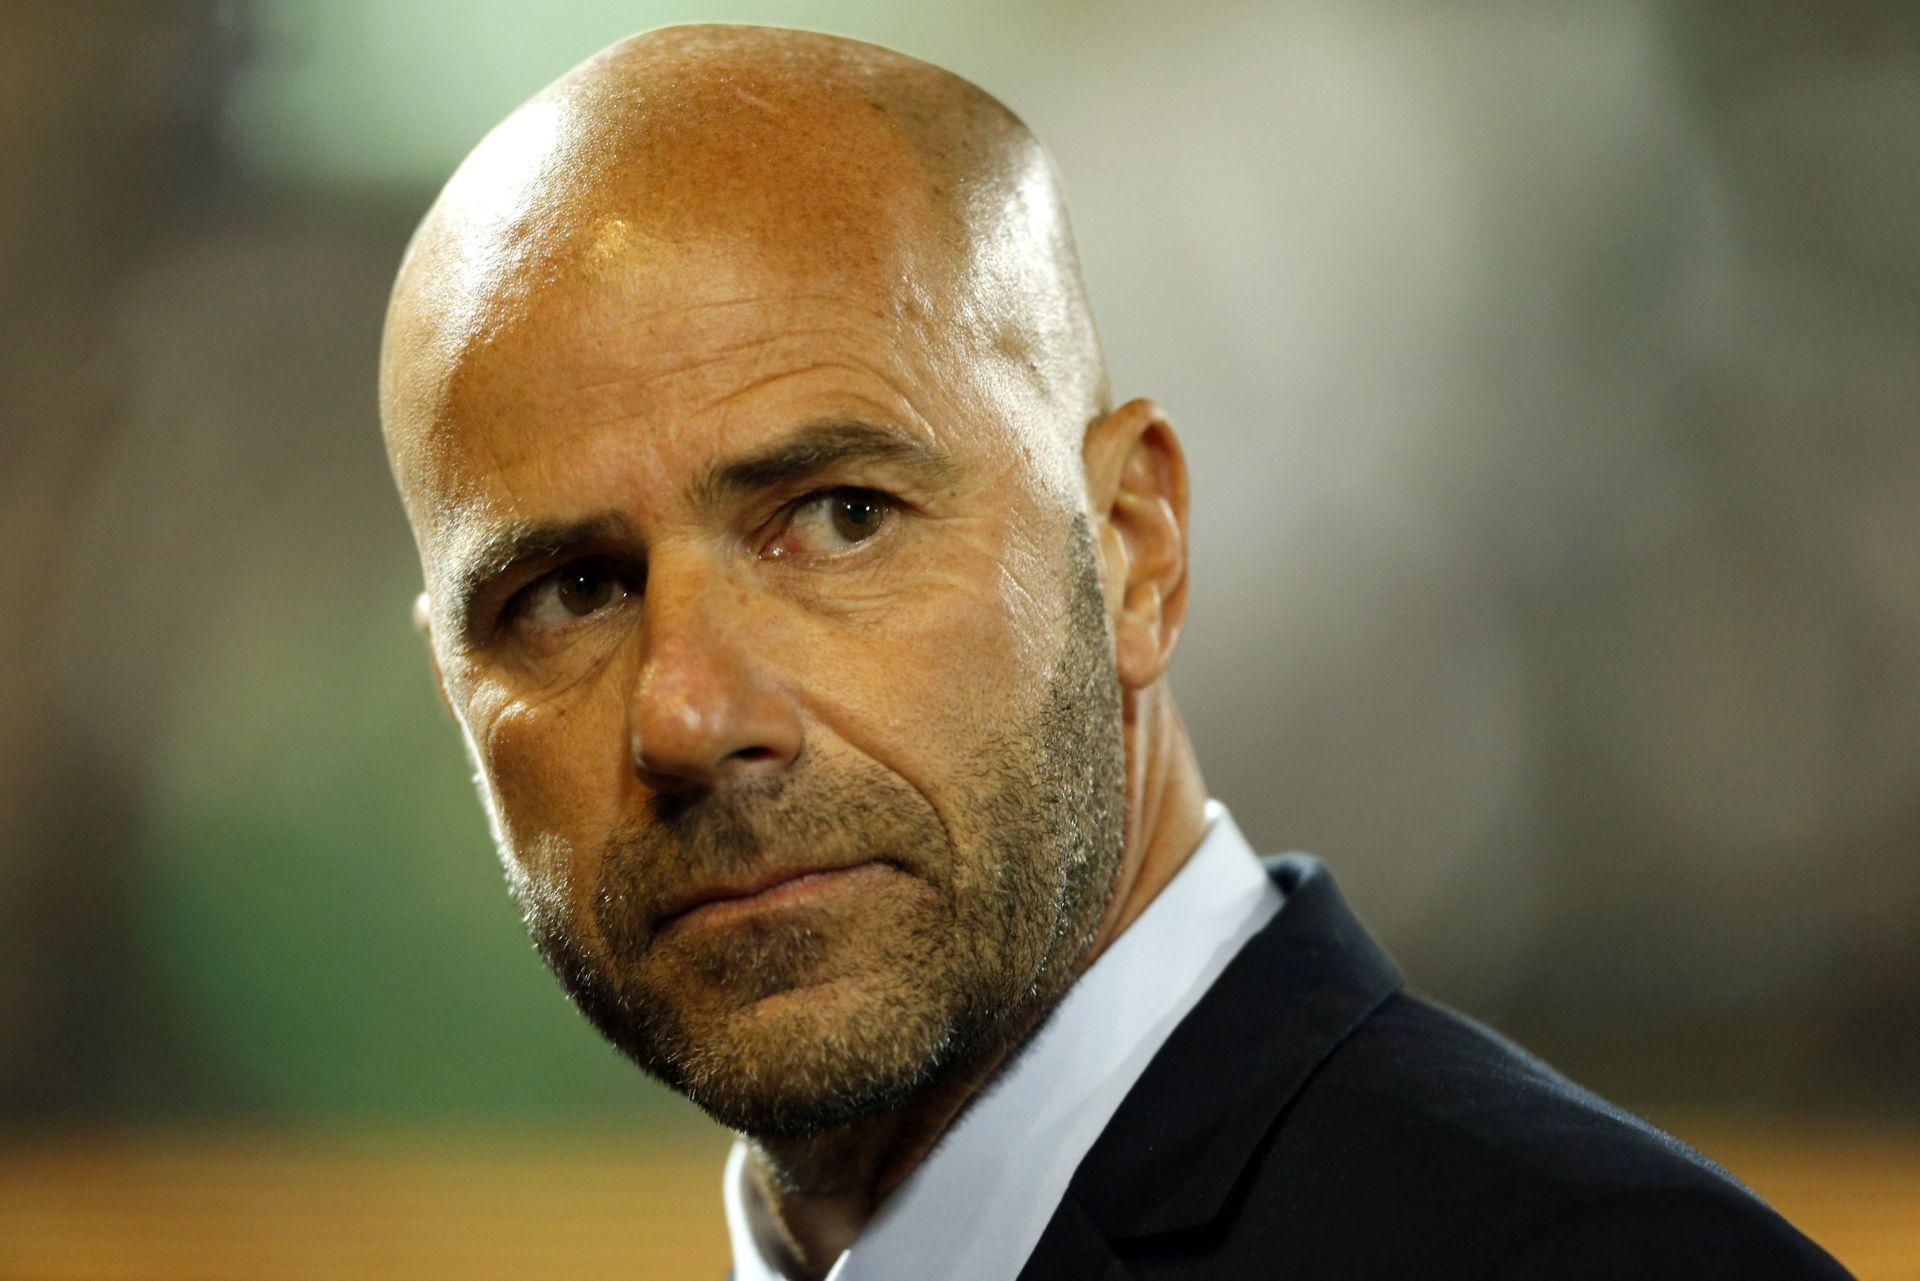 POTPISAN UGOVOR: Peter Bosz novi trener Ajaxa